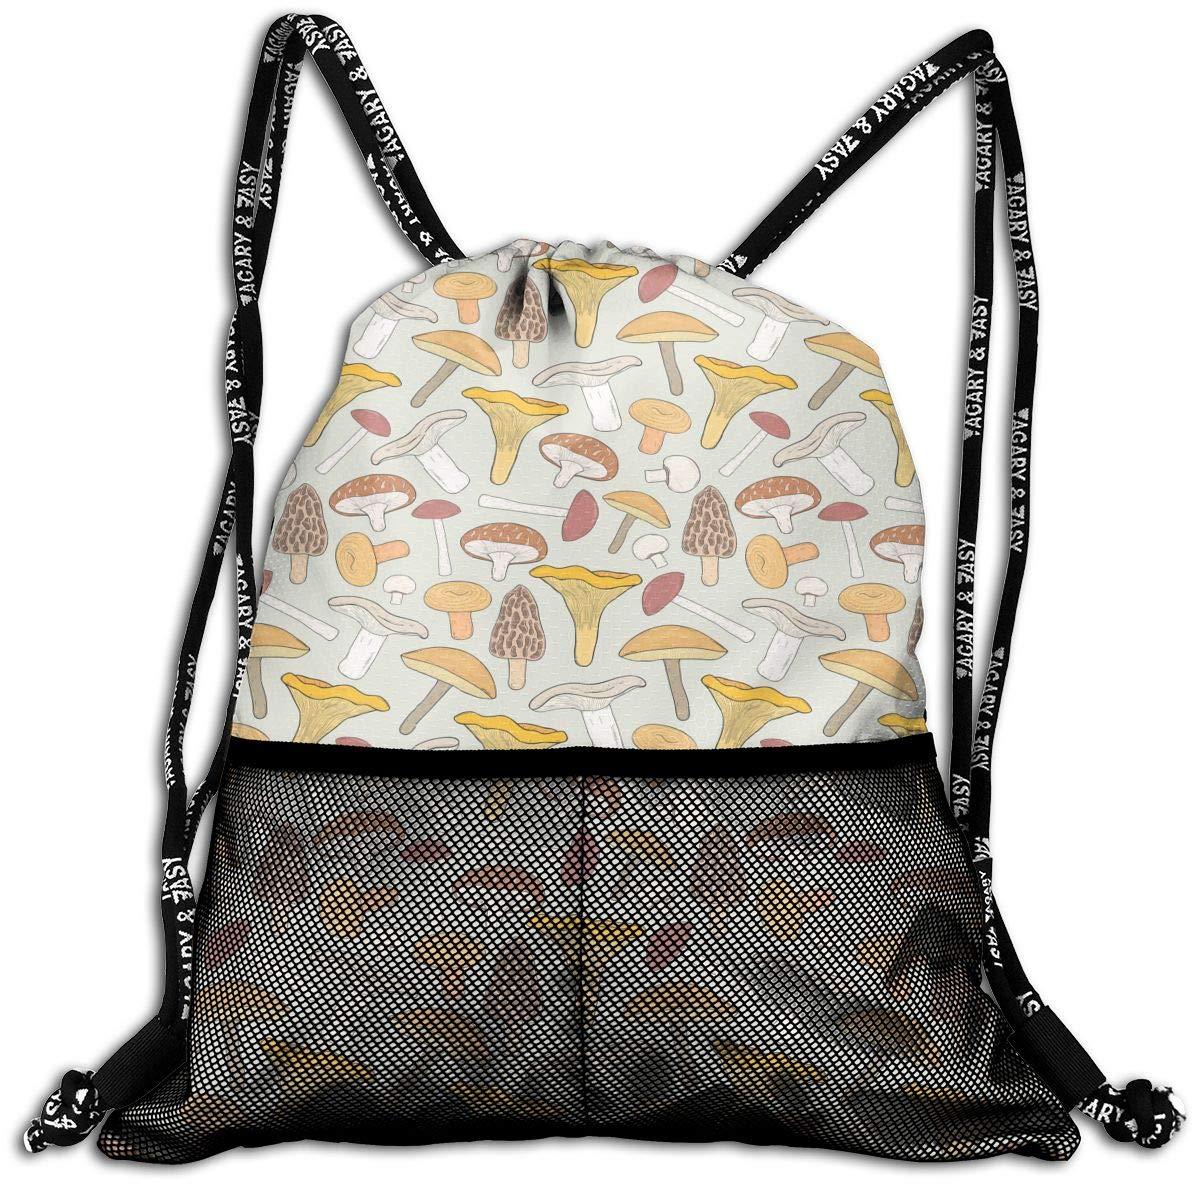 Unisex Drawstring Backpack Edible Mushrooms Yellow Casual Portable Sports Gym Bag Travel Storage Bag